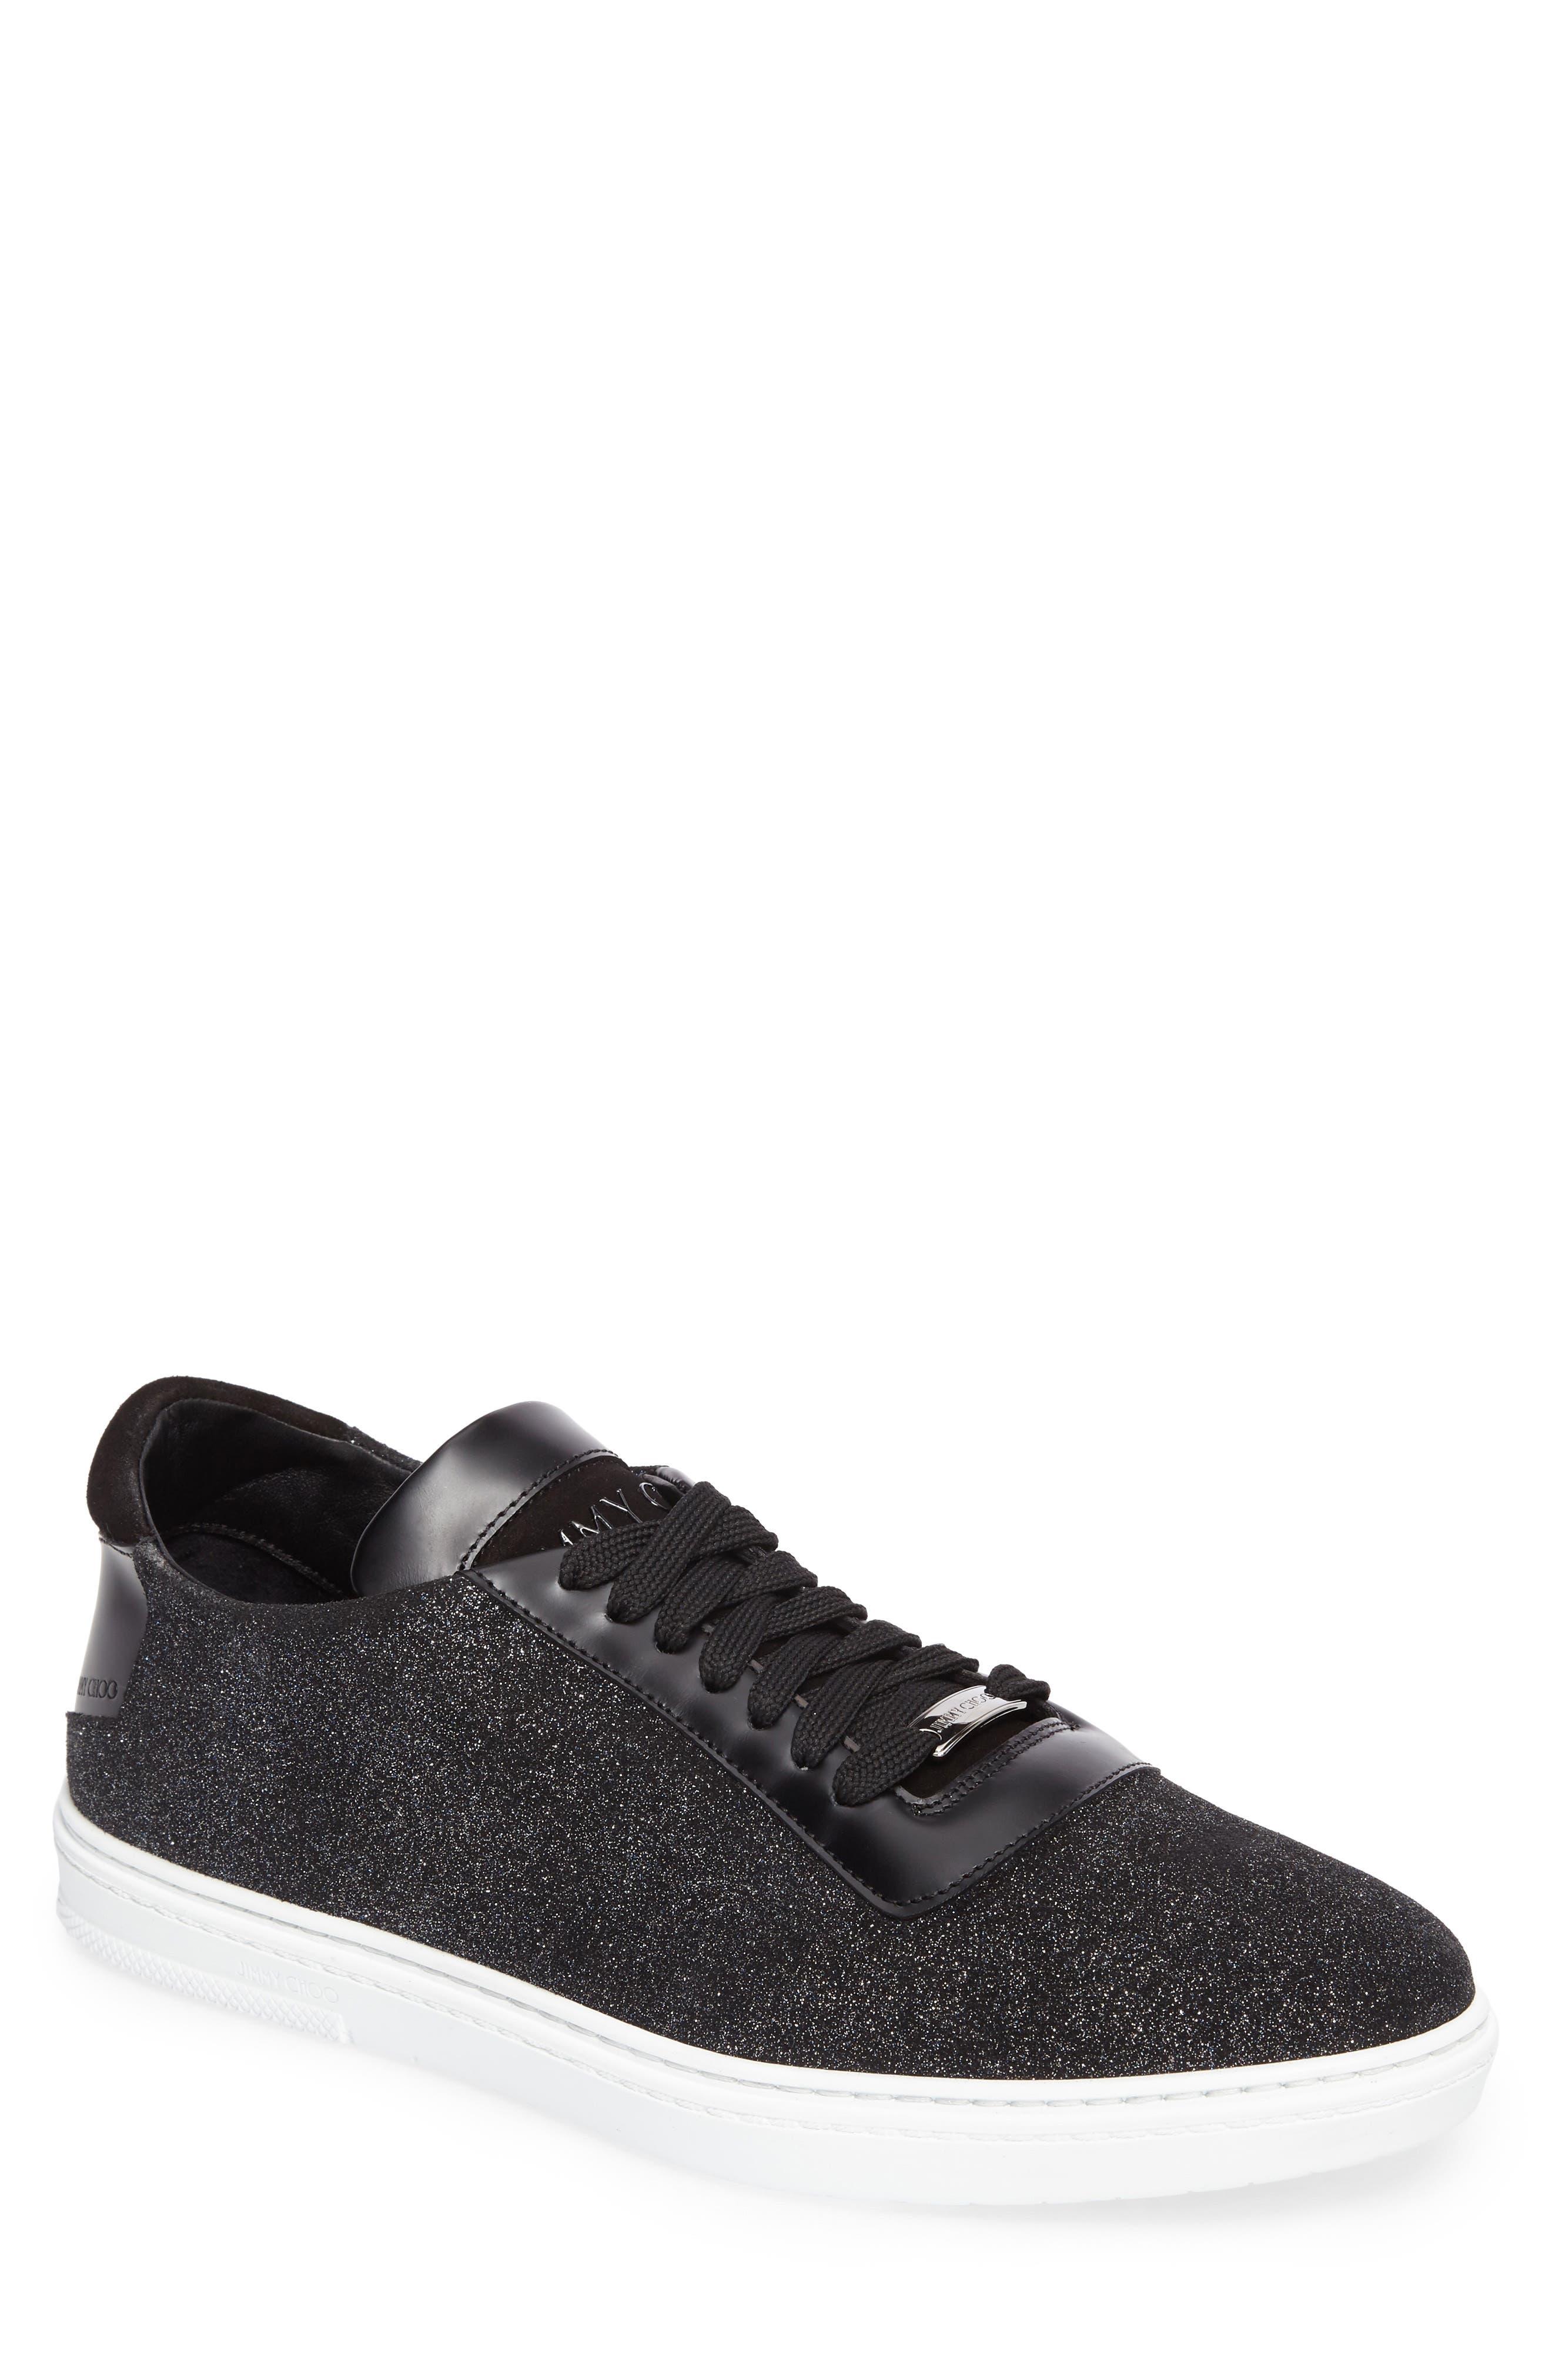 Benn Glitter Low Top Sneaker,                         Main,                         color,